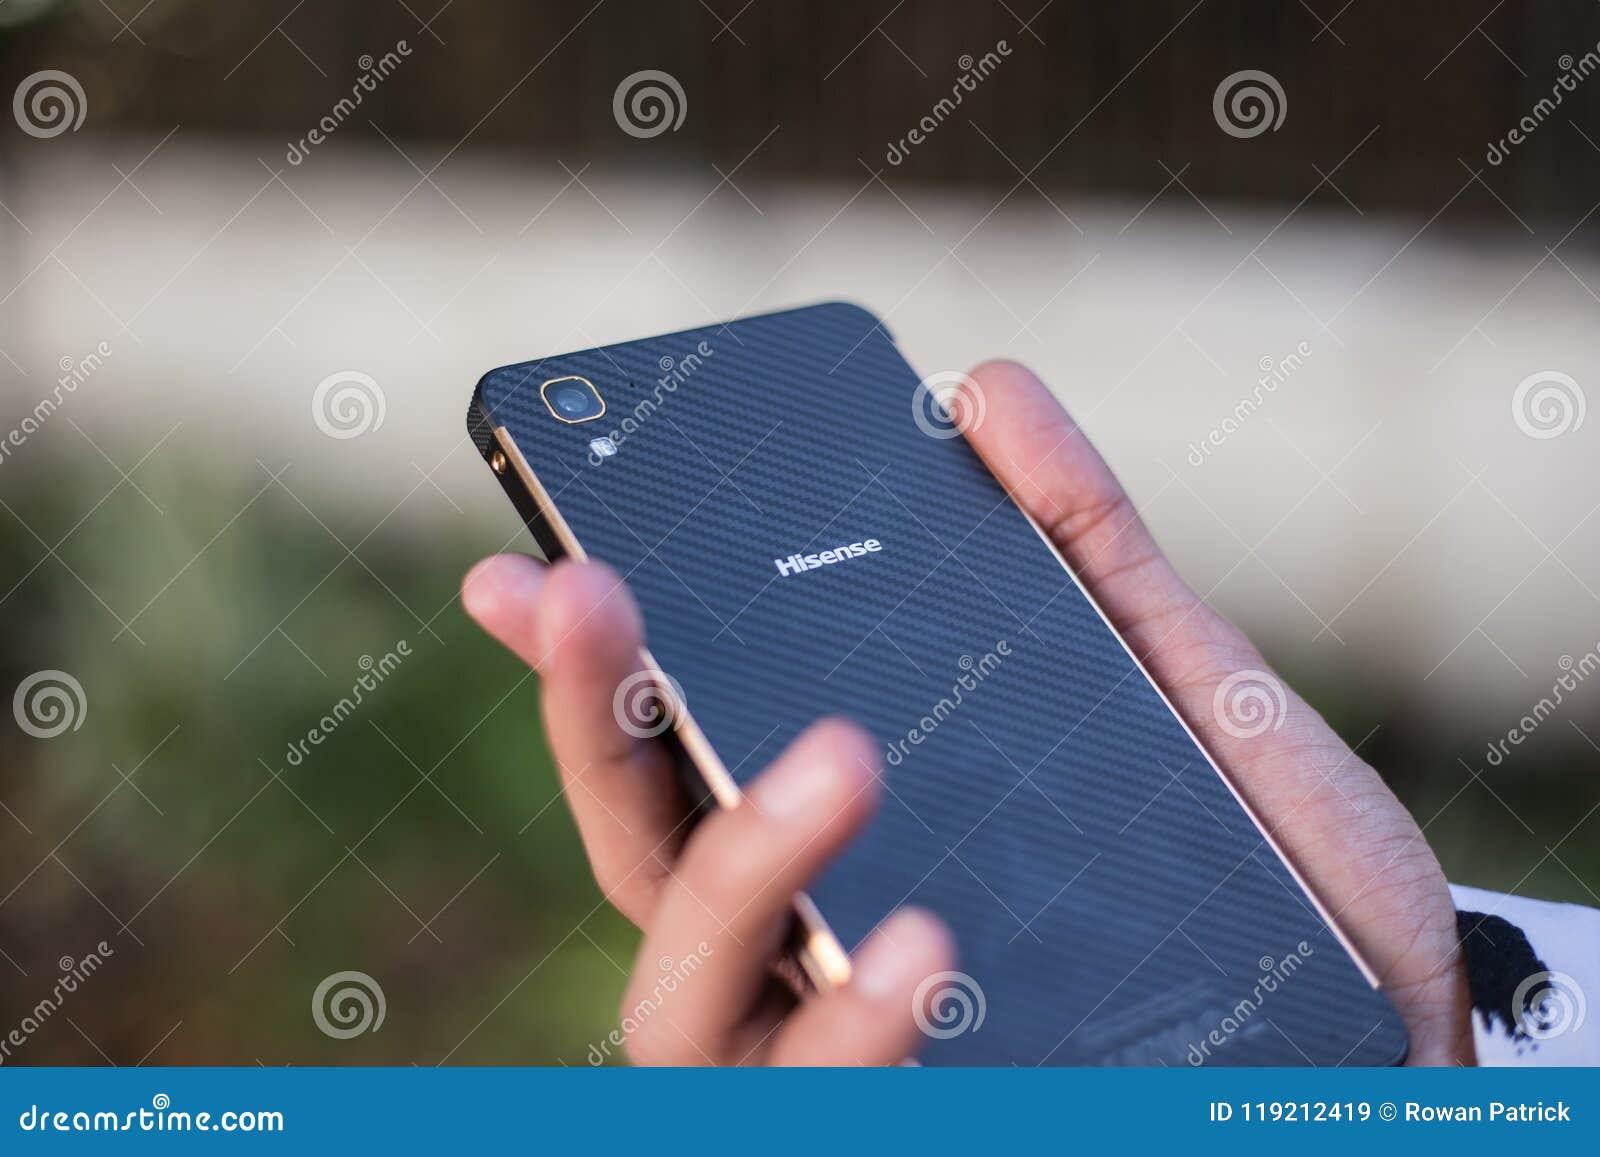 HiSense Phone in hand